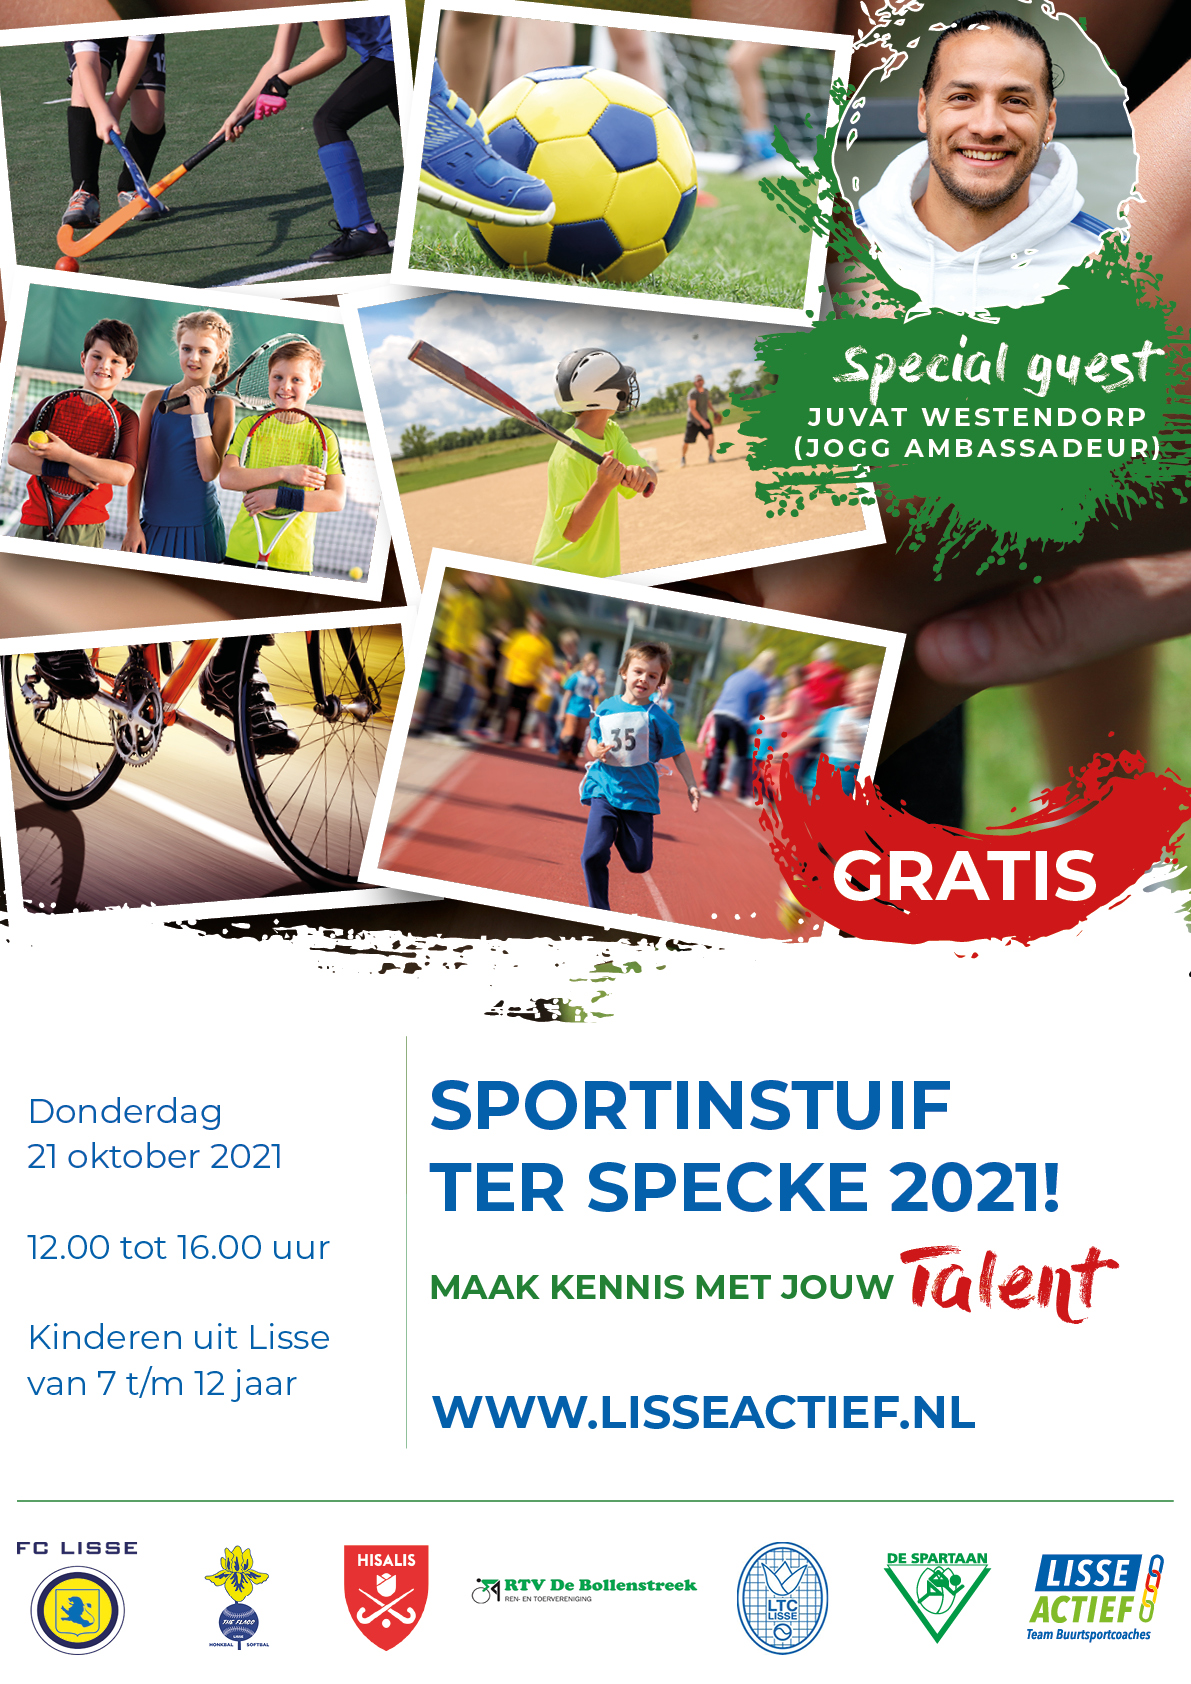 De Sportinstuif Ter Specke 2021!